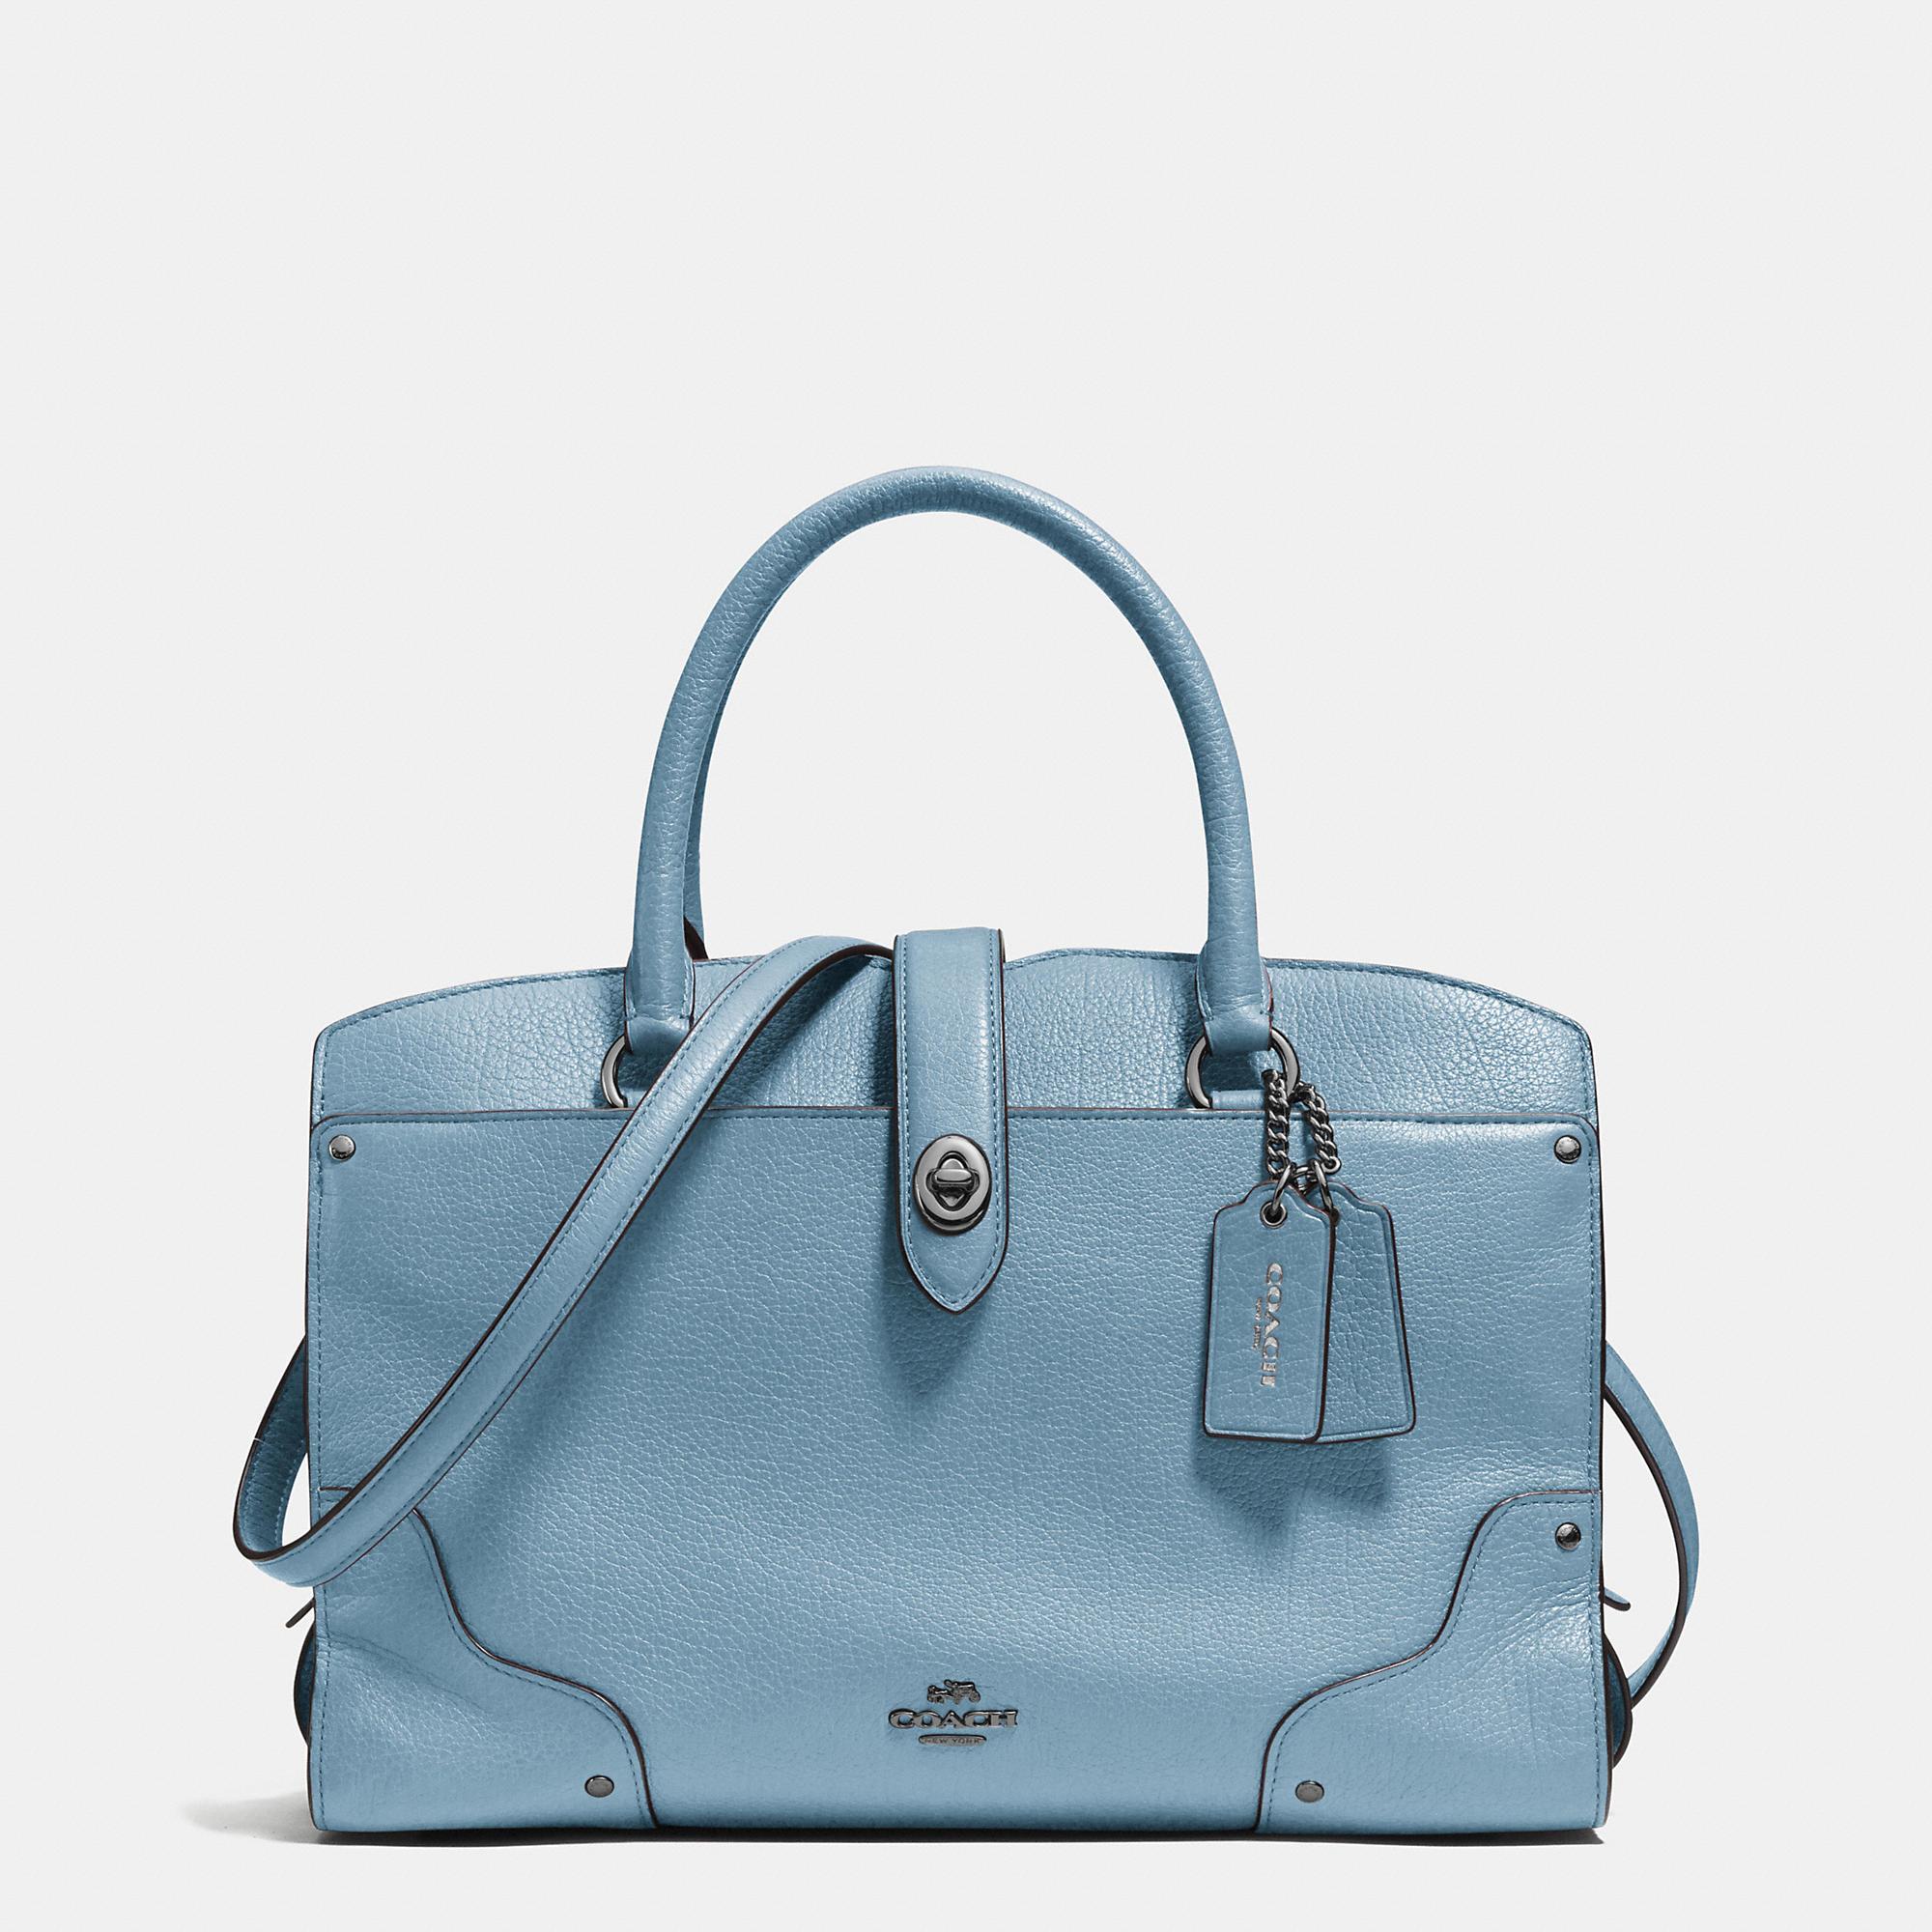 coach satchel bag outlet uun8  Coach Mercer Tote Bags Outlet Purses